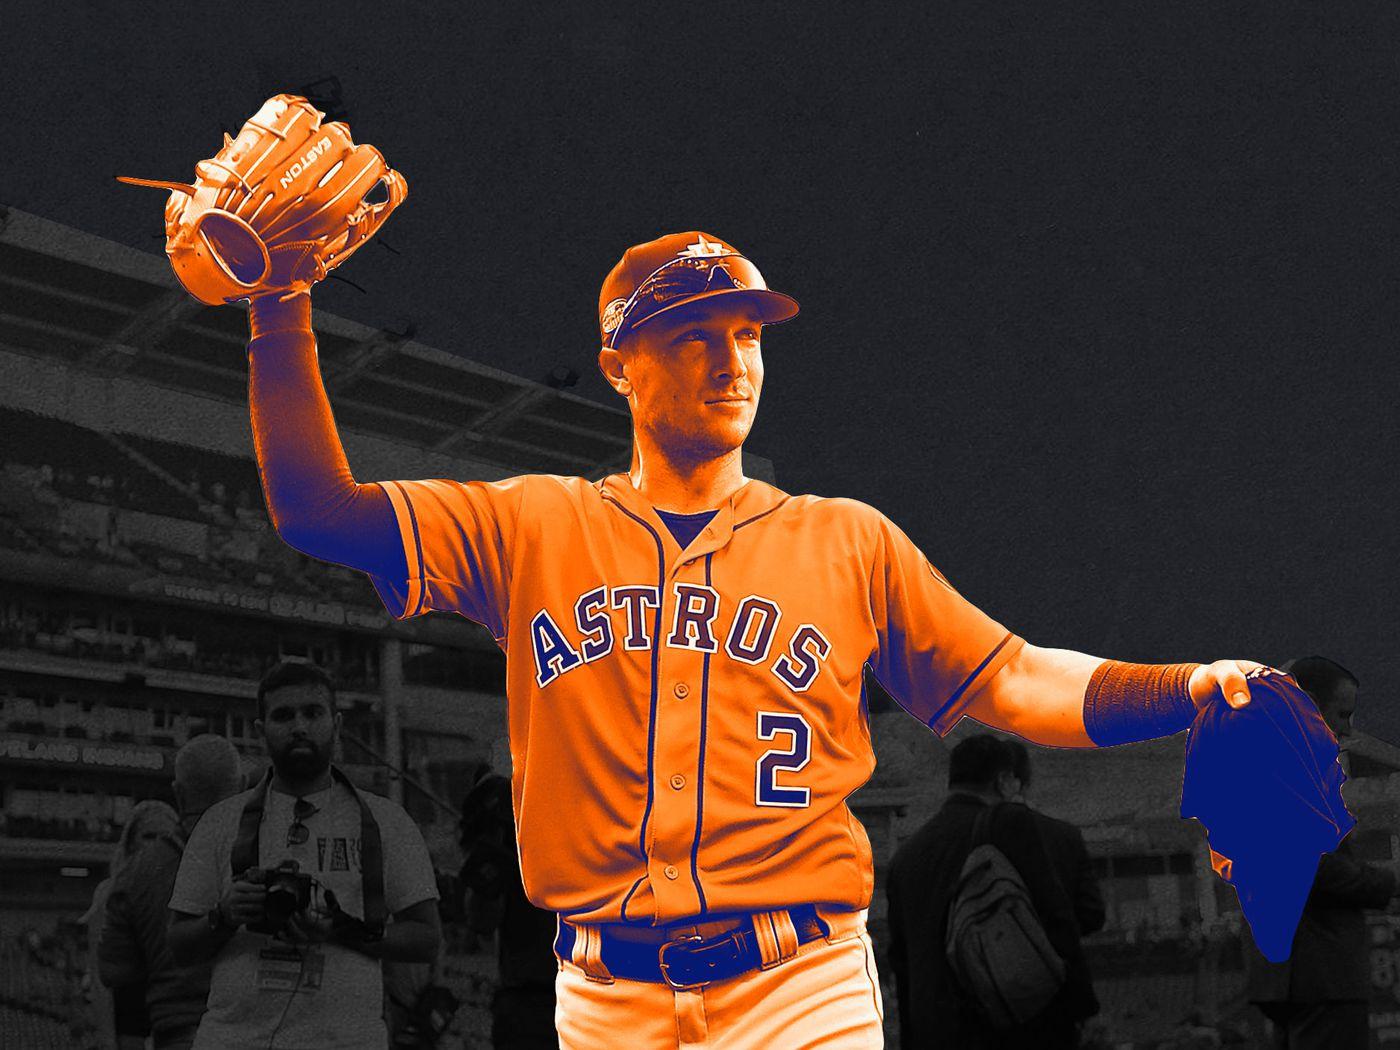 Alex Bregman Is Baseball's Next Supervillain - The Ringer